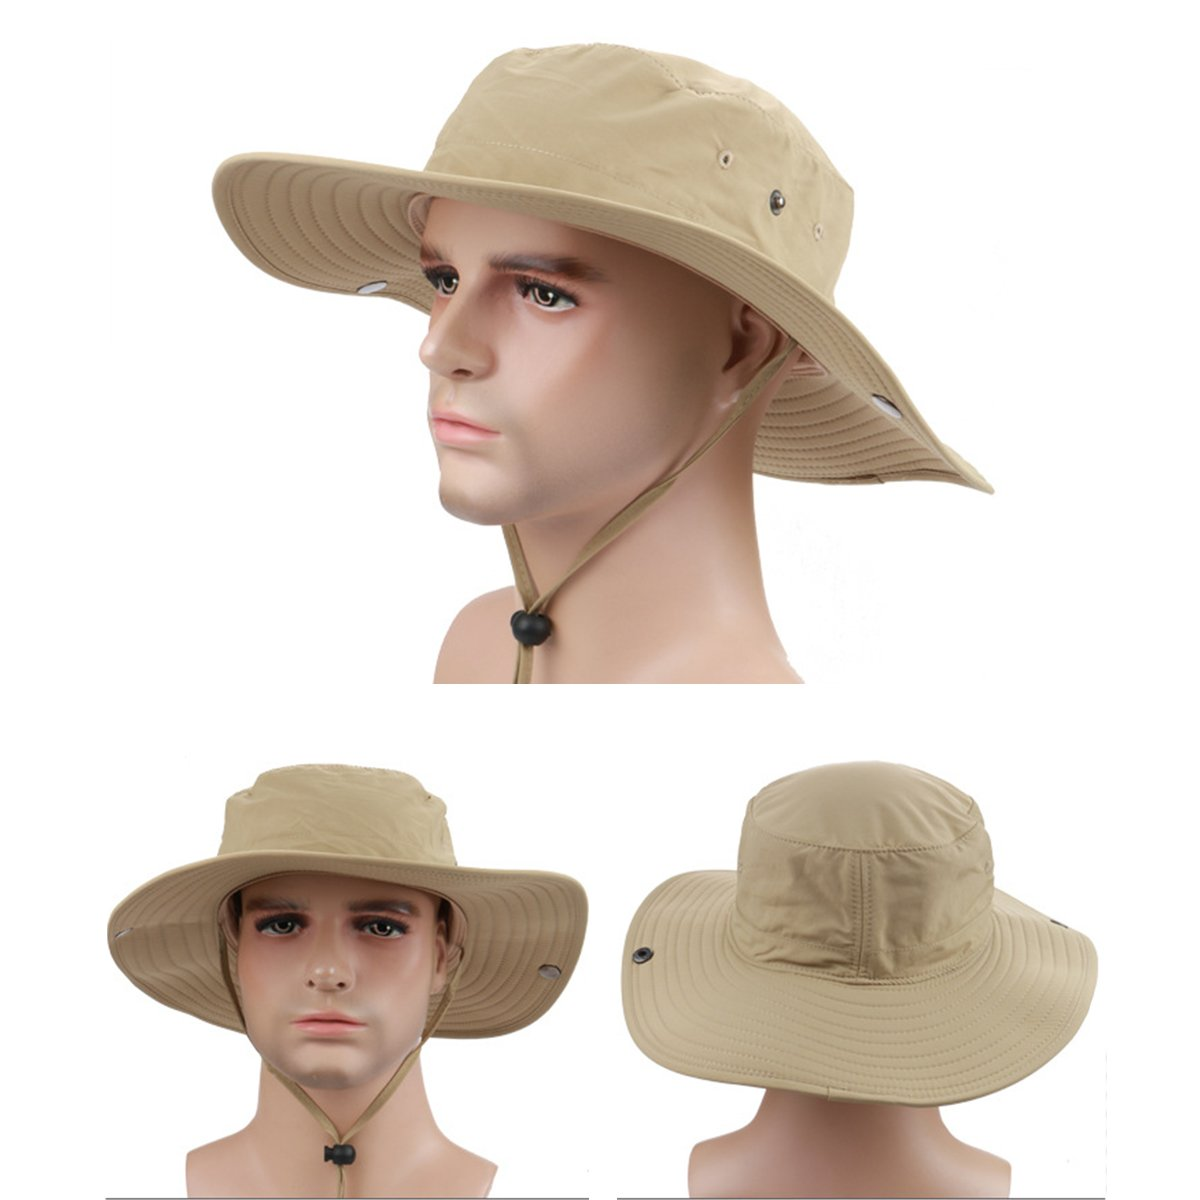 da629ddcaf9 Surblue Wide Brim Cowboy Hat Collapsible Hats Fishing Golf Hat Sun Block  UPF50+ - XYTSH005A-KHAKI-JP   Sun Hats   Clothing